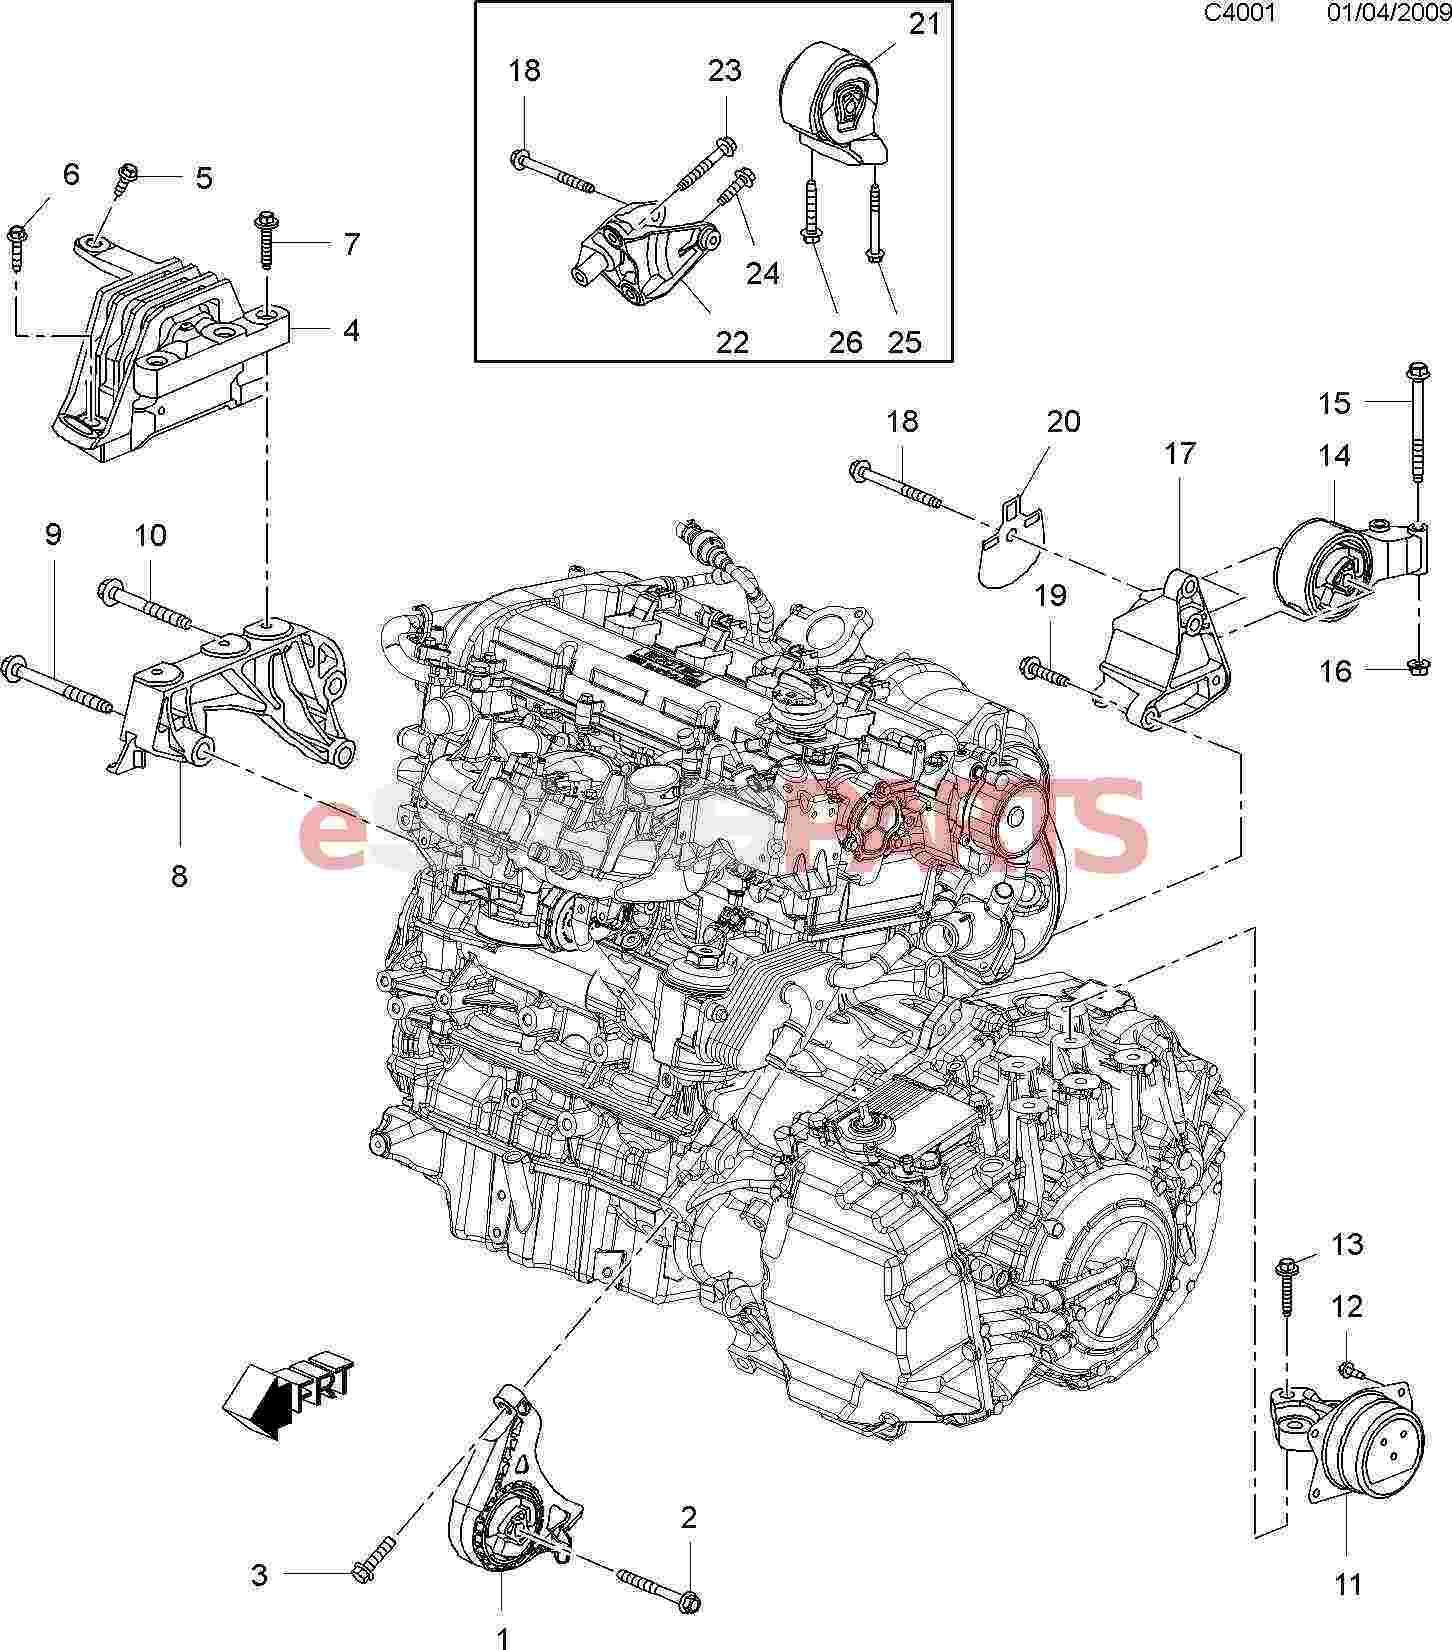 Saab Vibration Damper